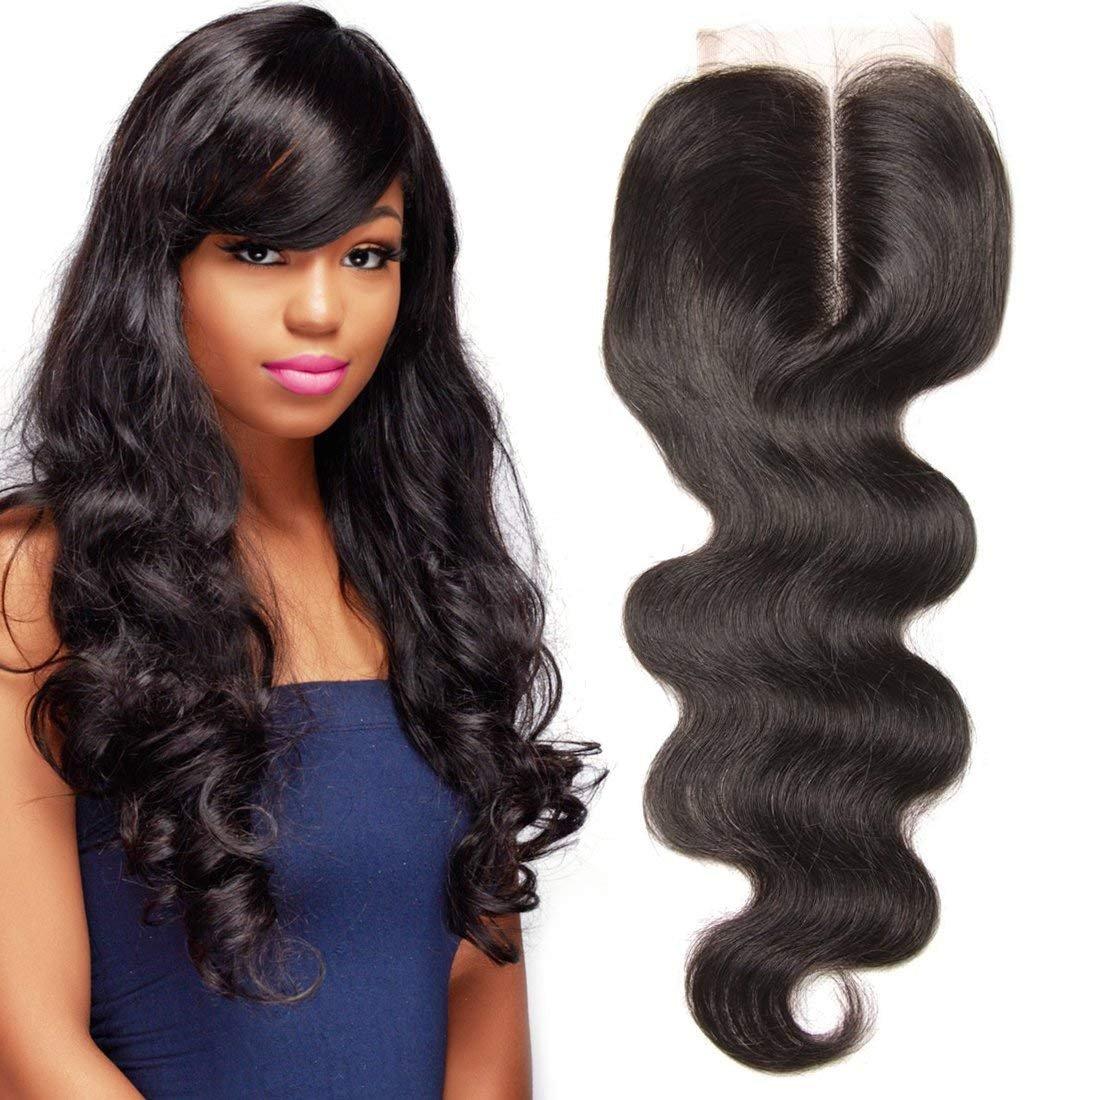 Amazon Unice Hair 22 20 18inch Brazilian Virgin Human Hair